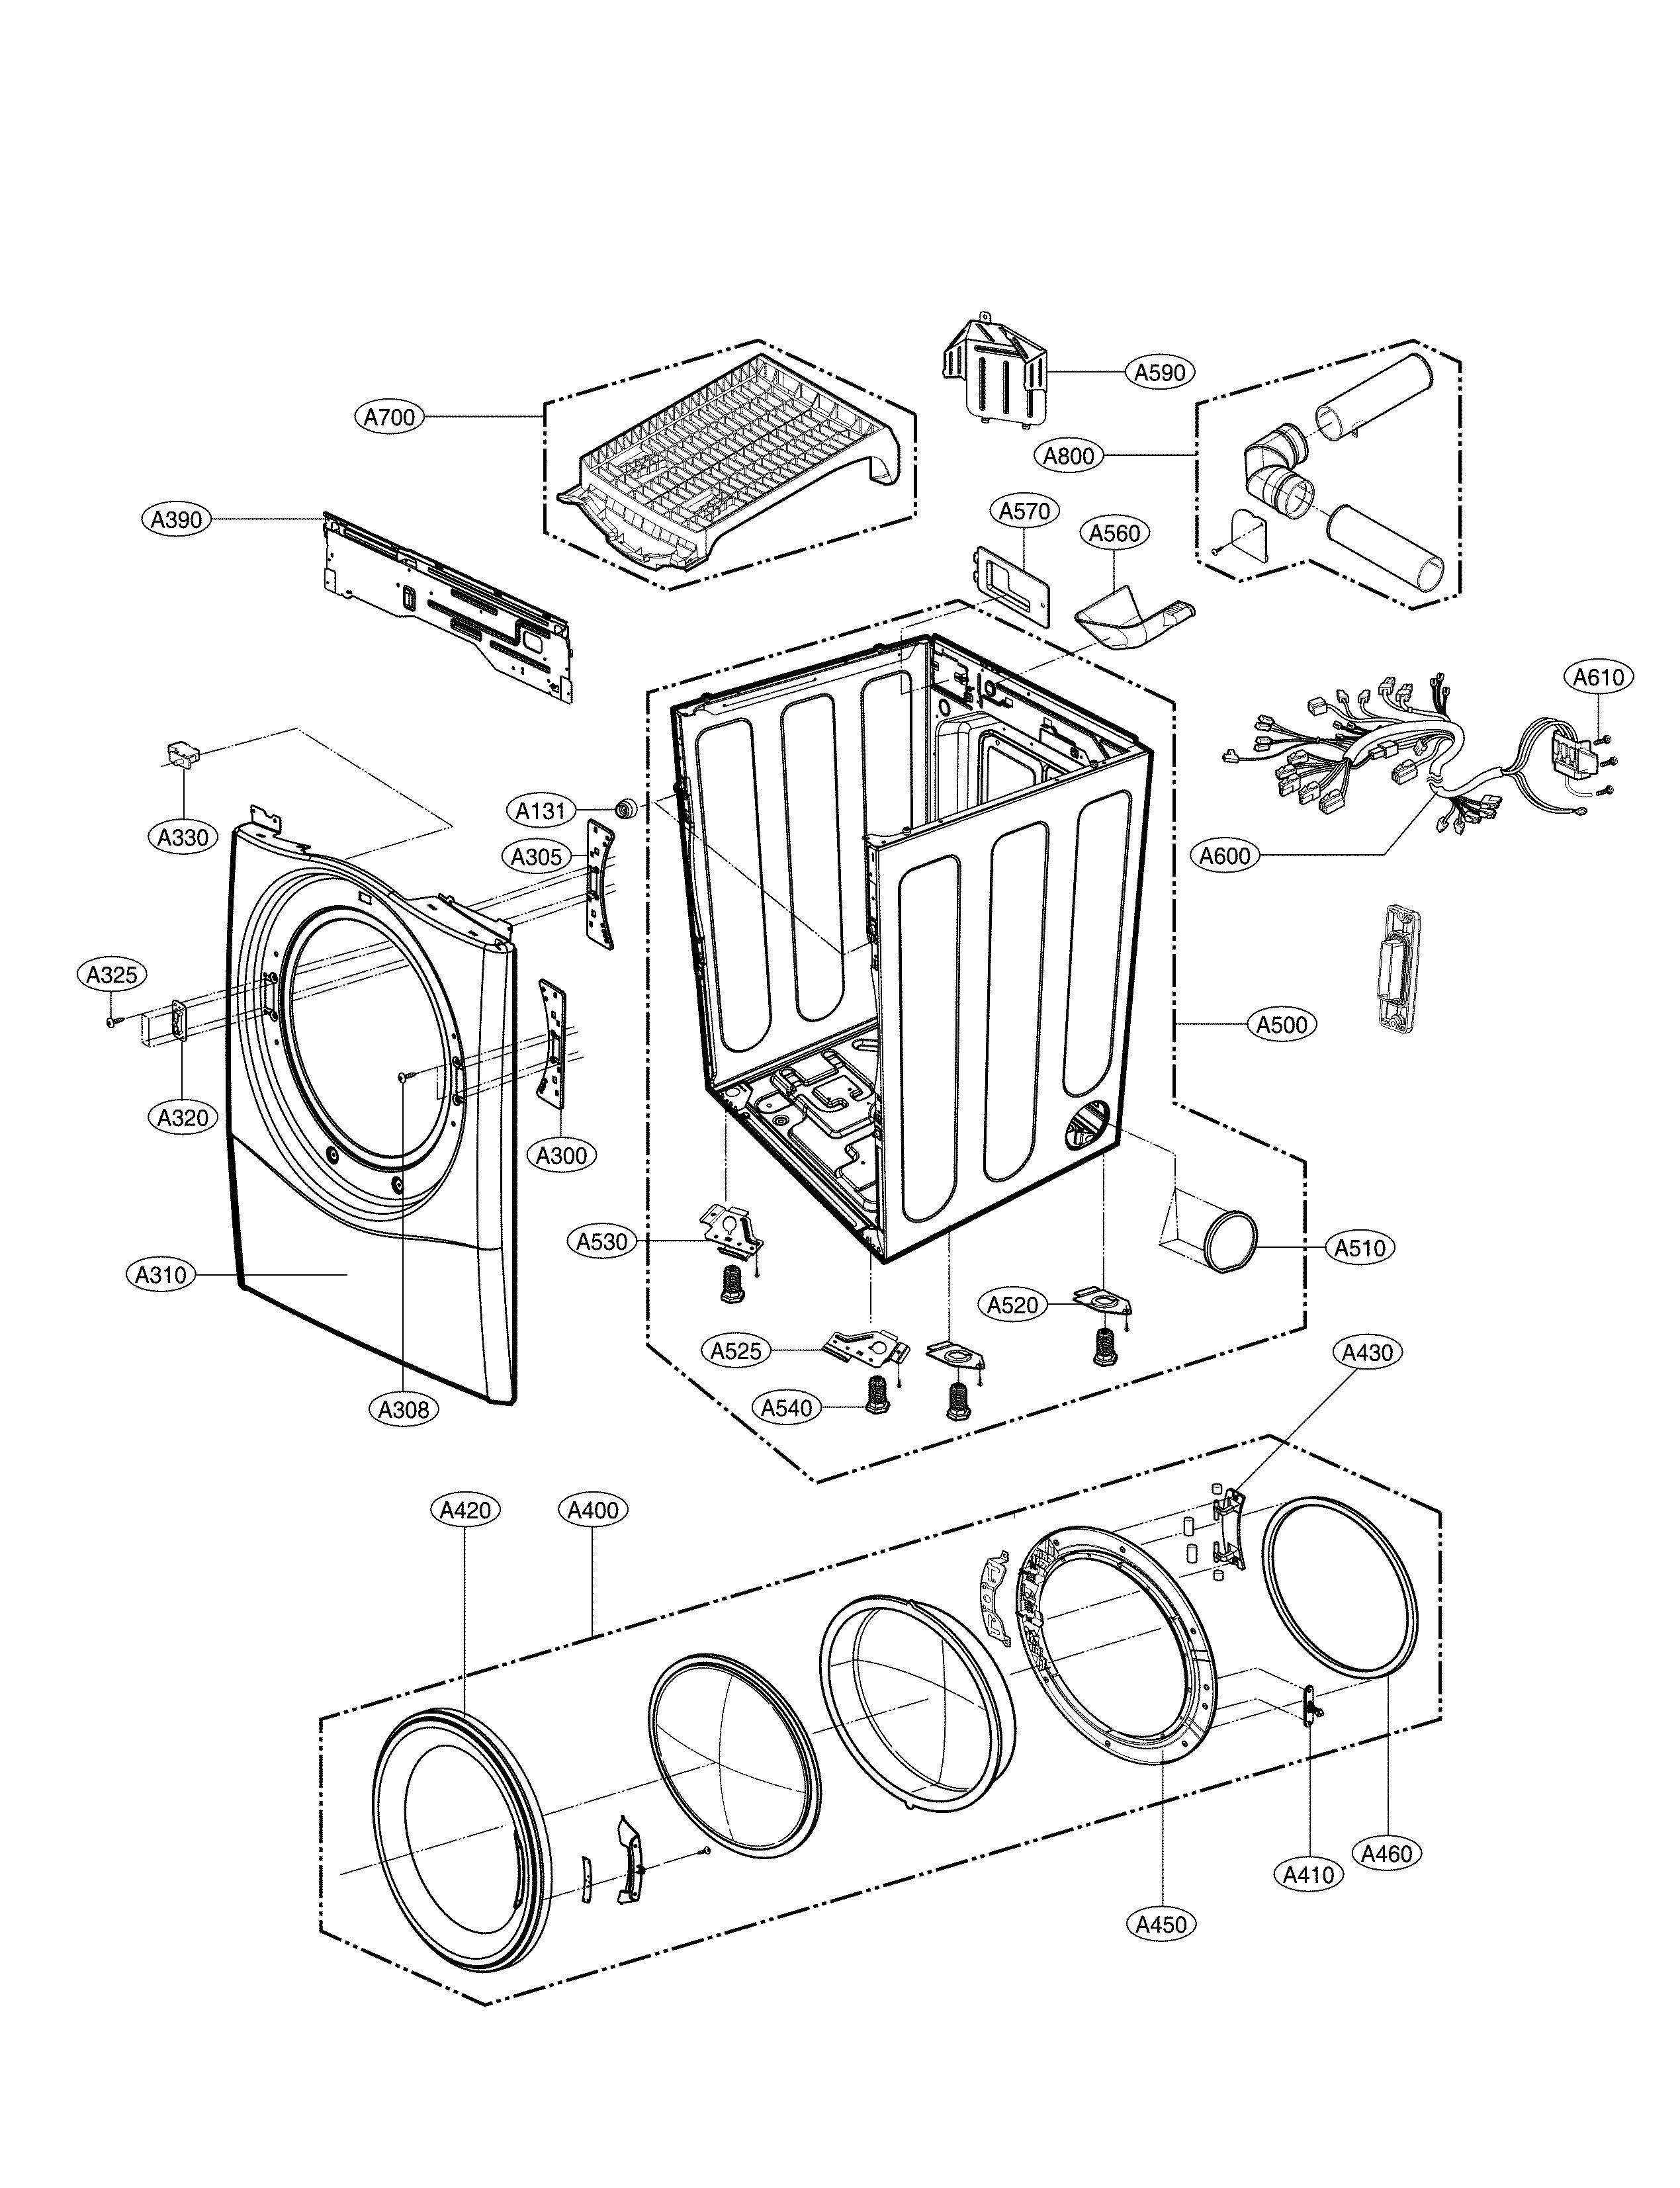 Lg model DLEX3570V residential dryer genuine parts